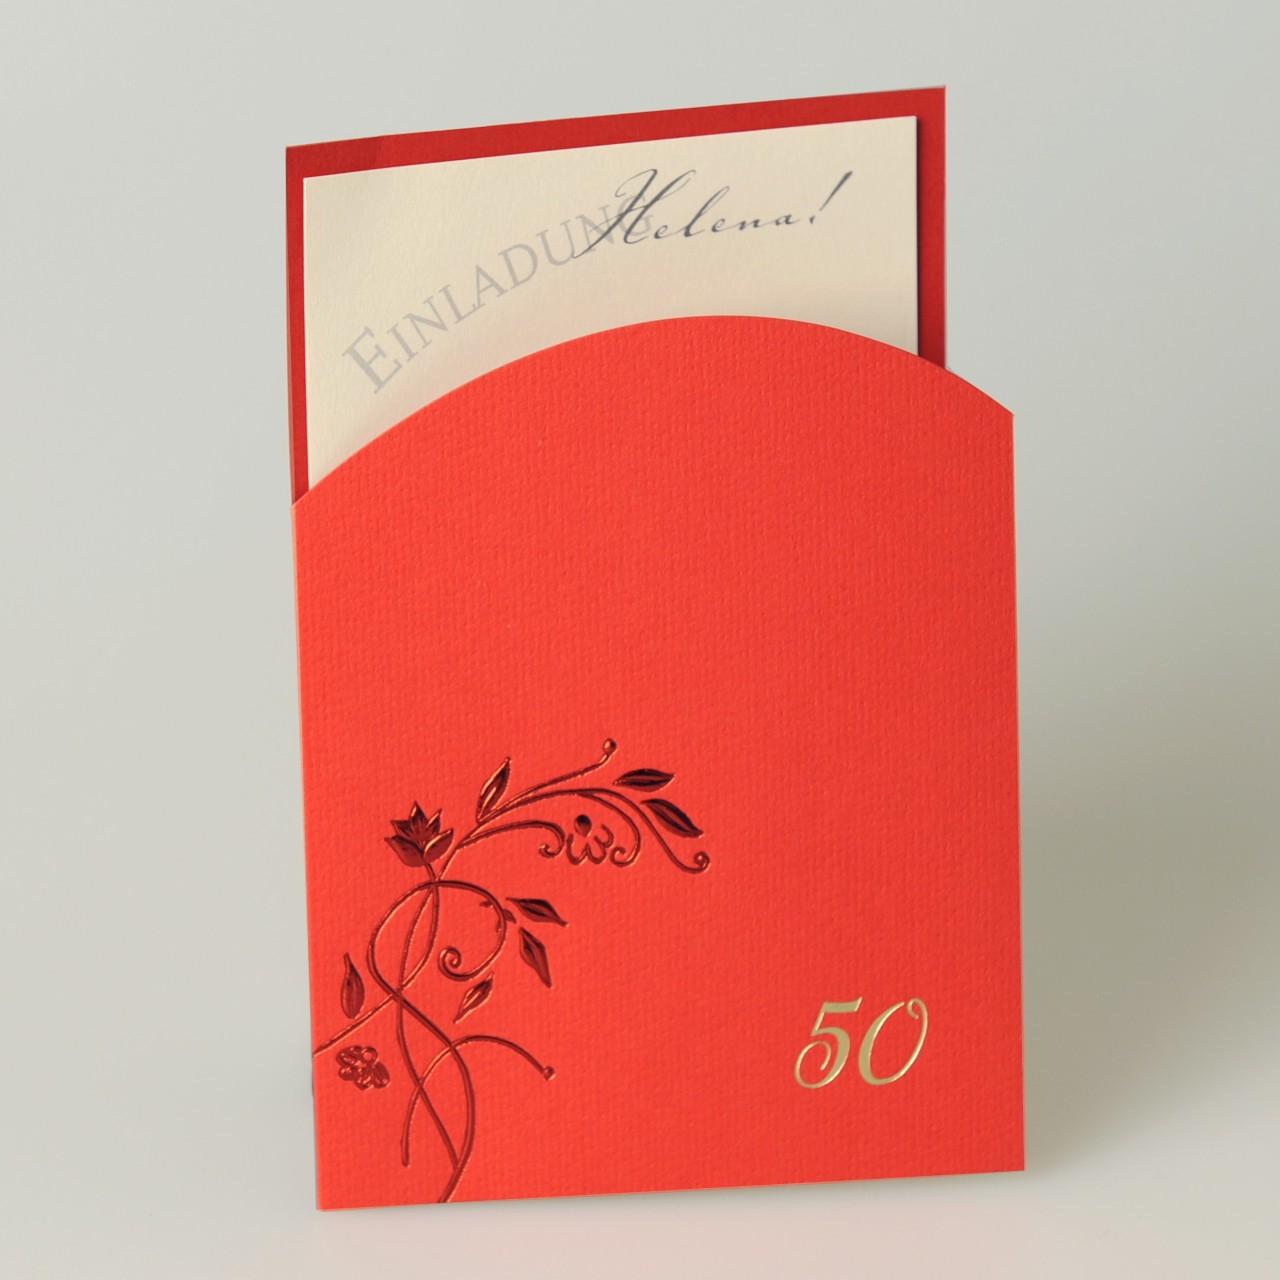 Einladungskarte - A 2014